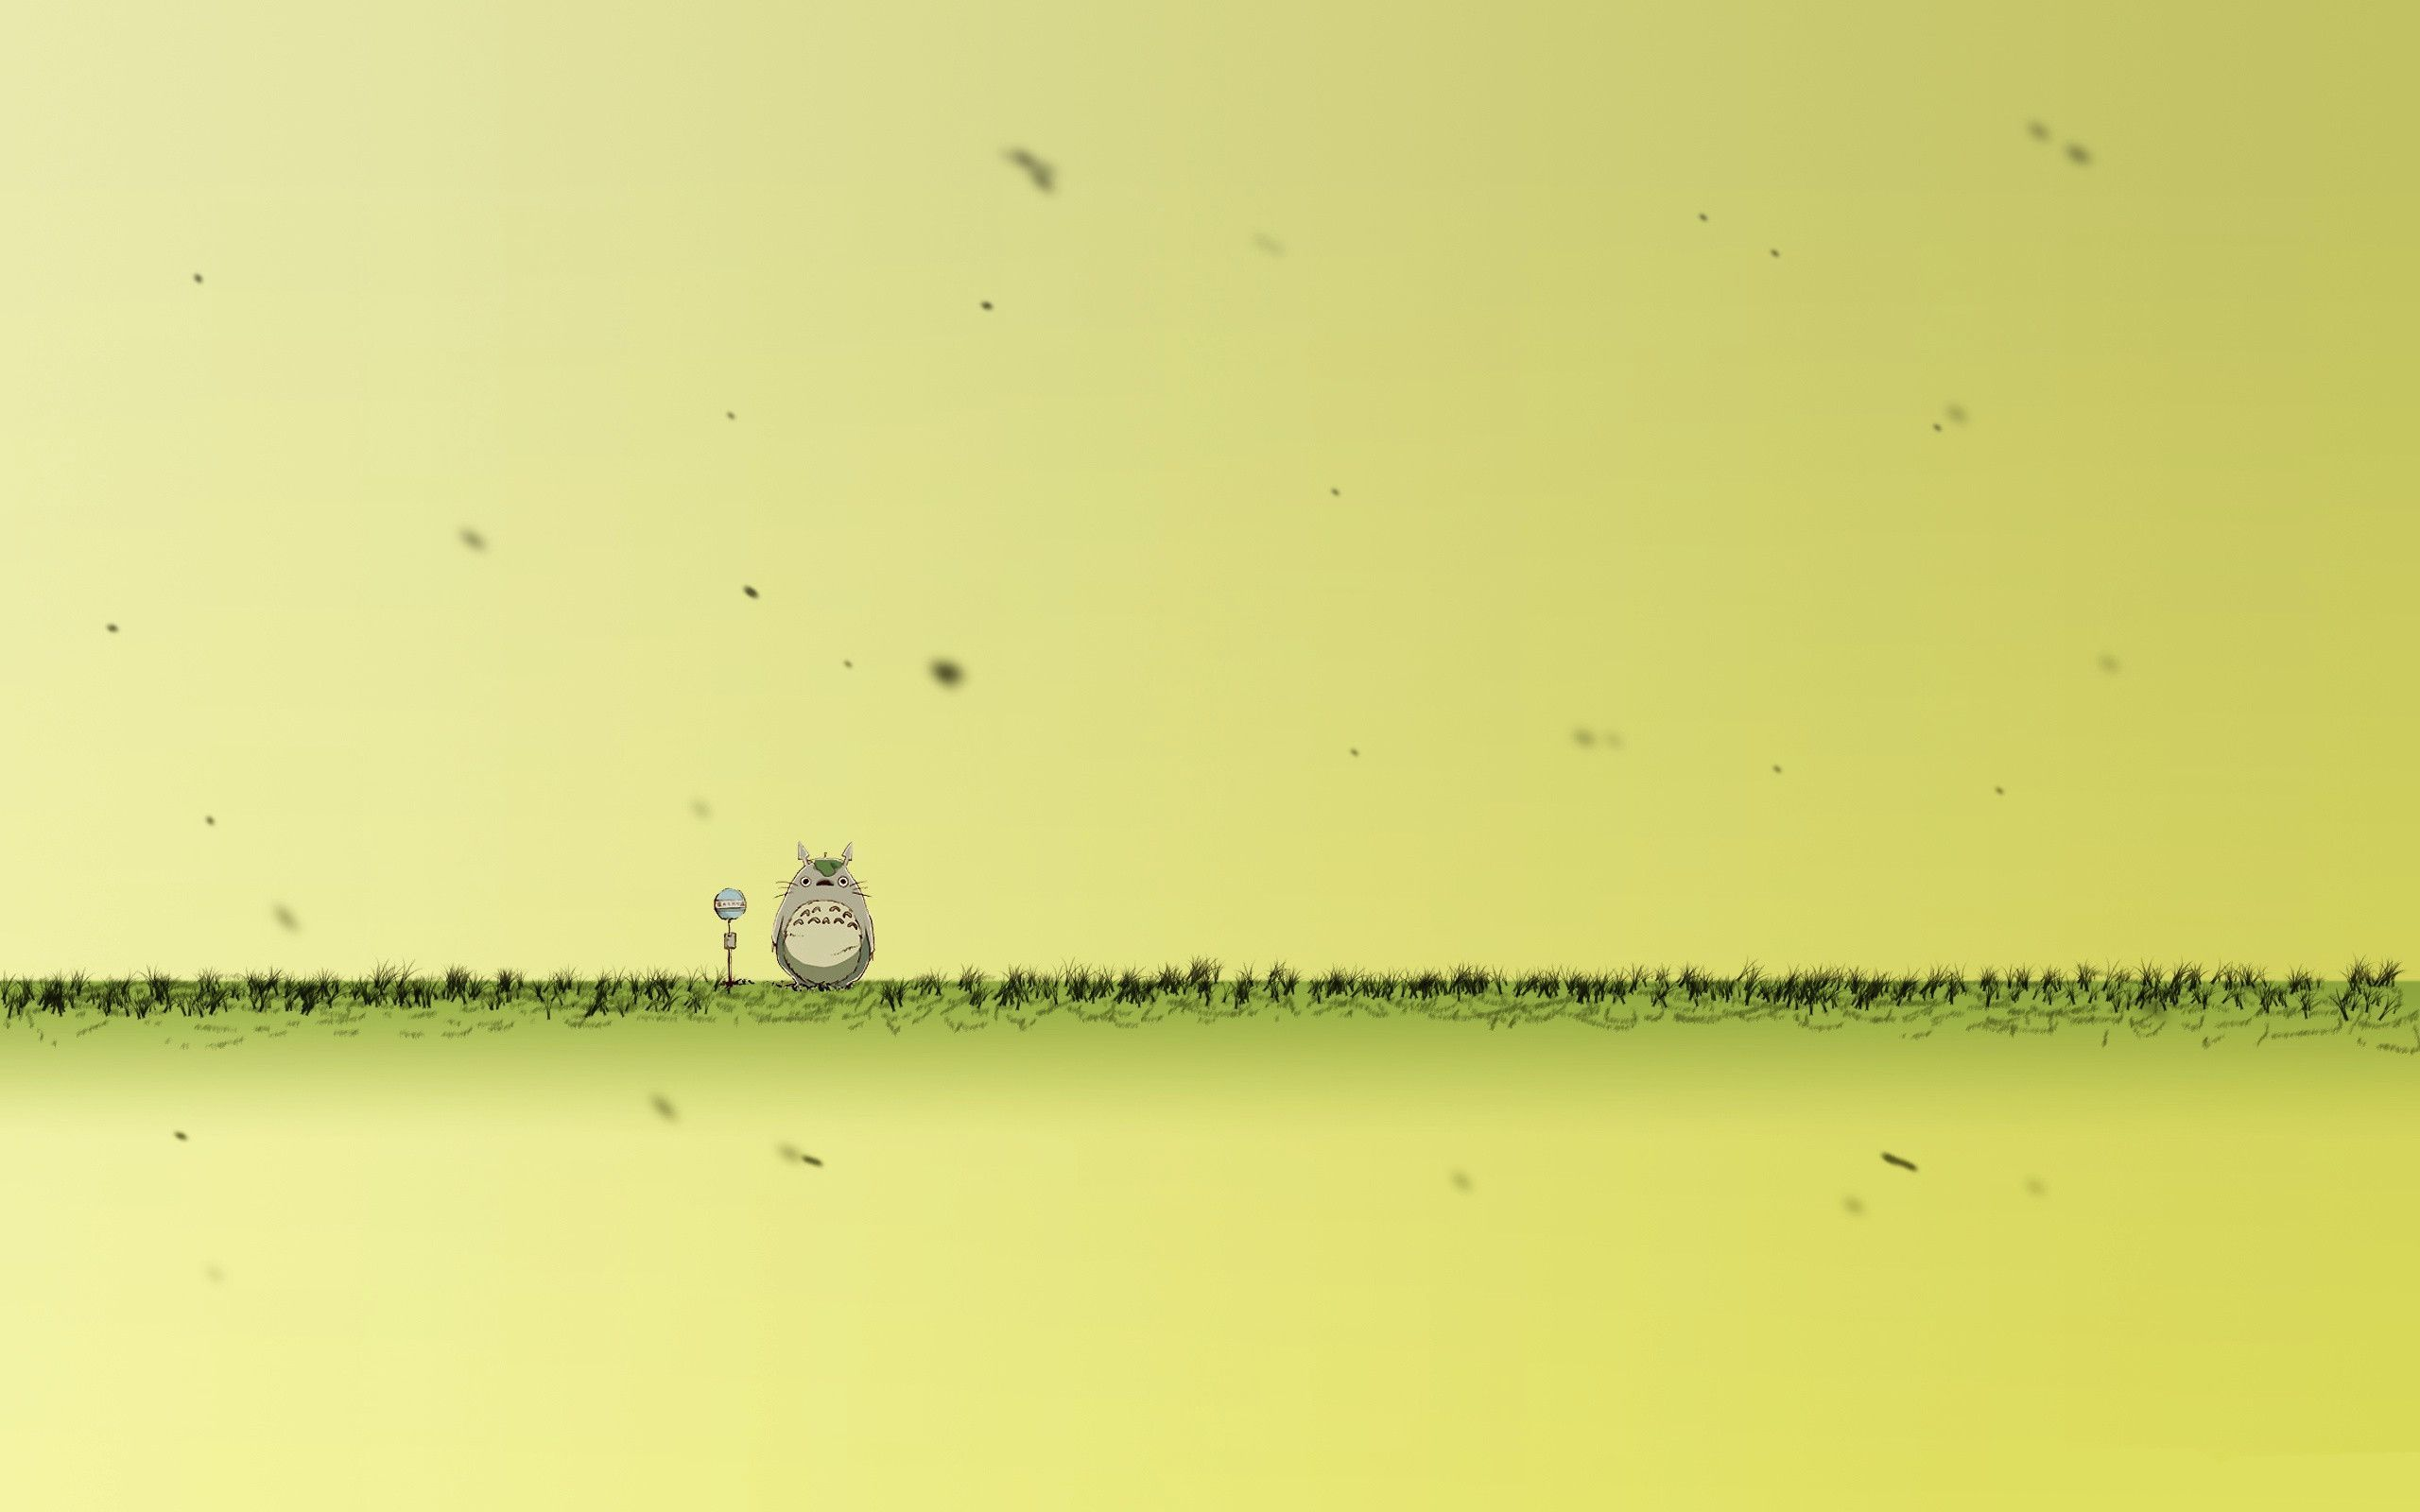 Totoro-Wallpaper-Full-HD.jpg (2560×1600) | Totoro | Pinterest | Totoro